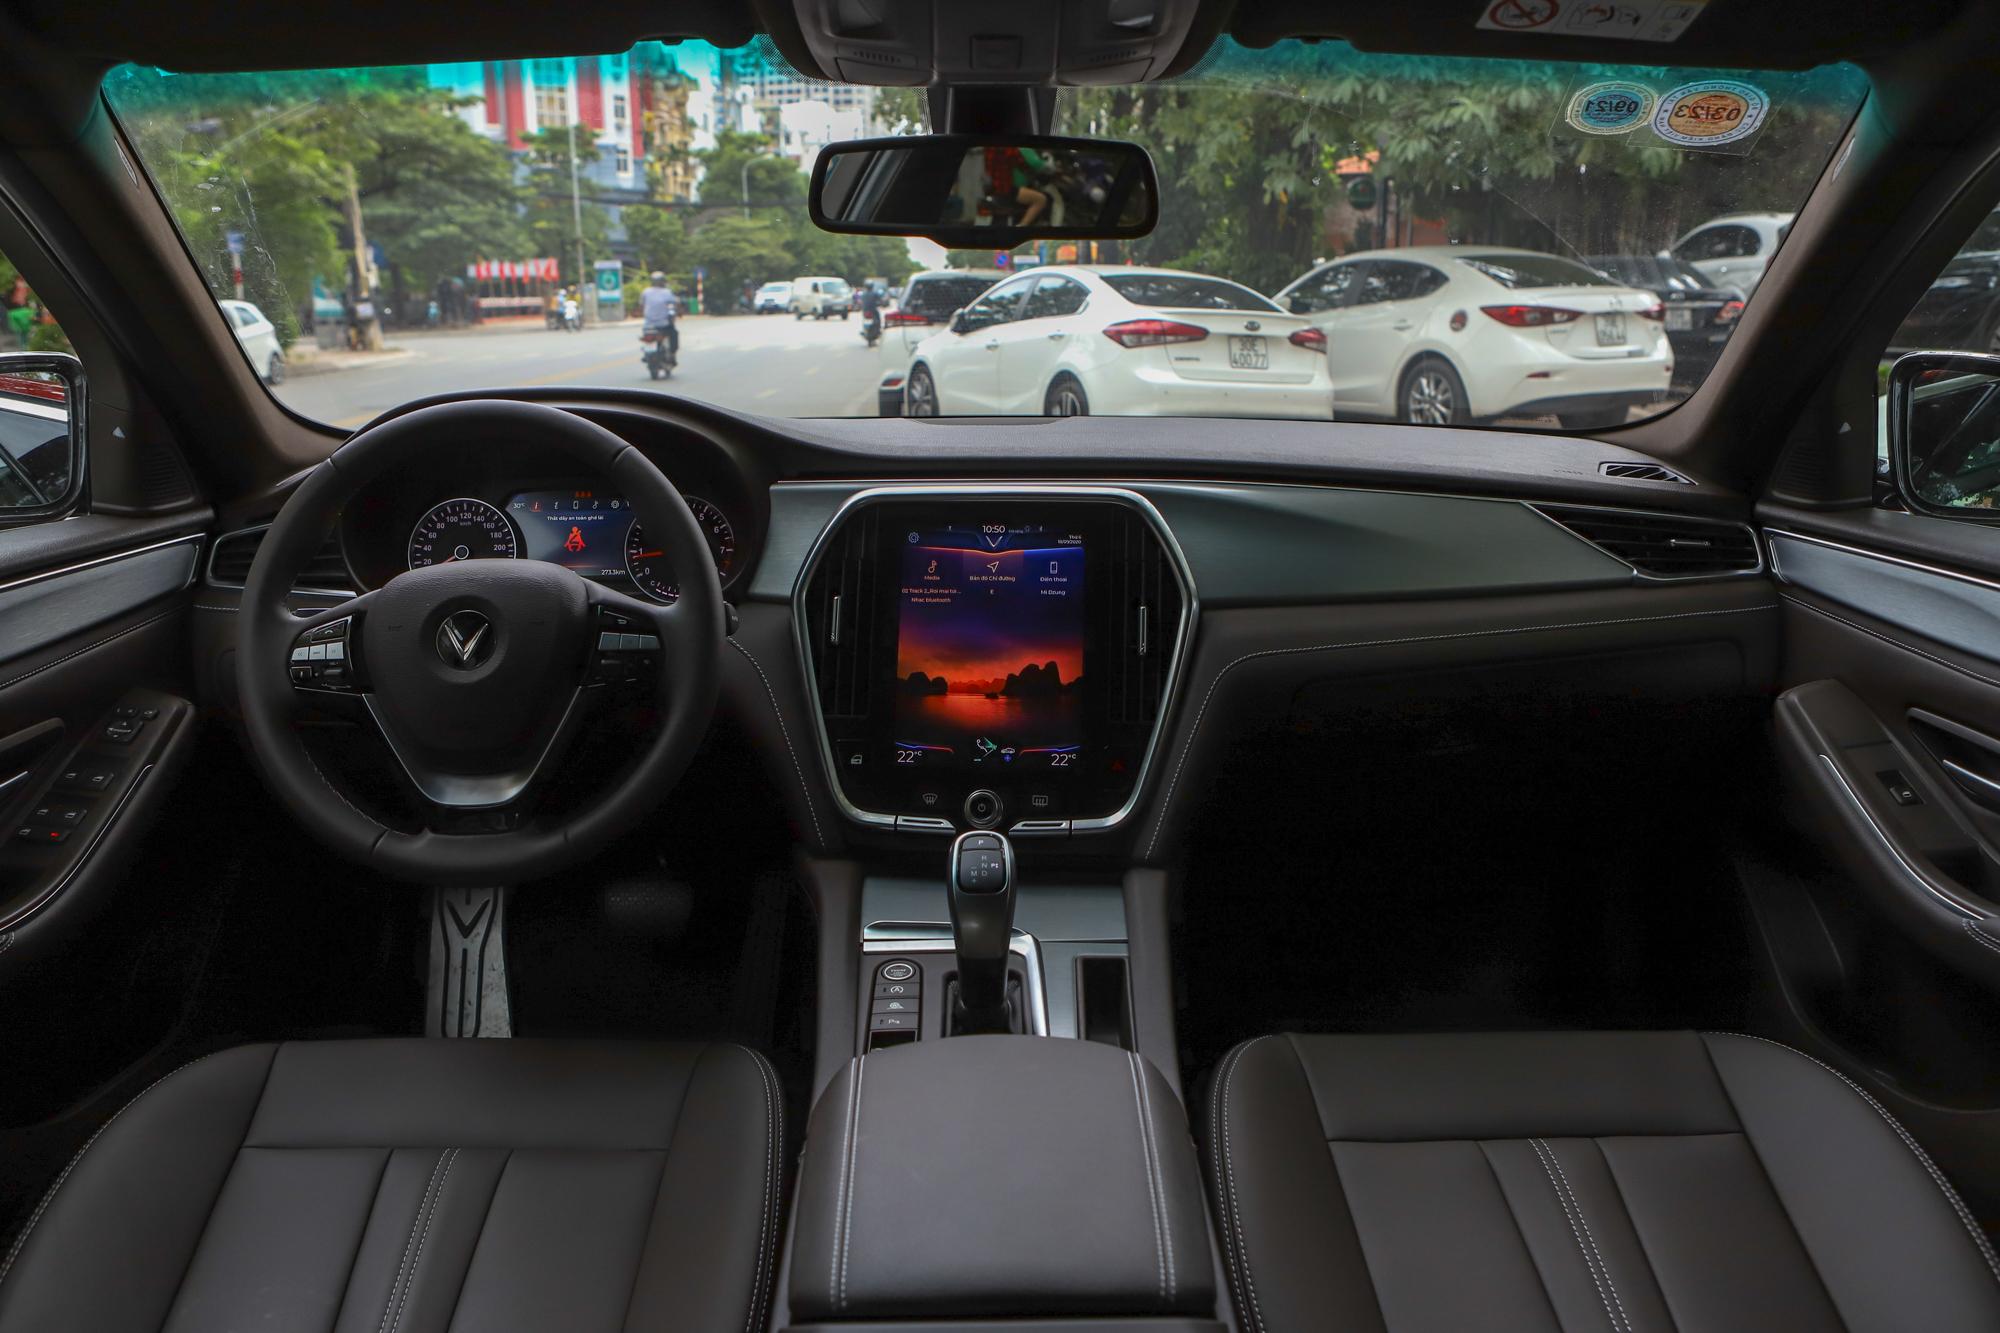 Nội thất VinFast Lux A2.0